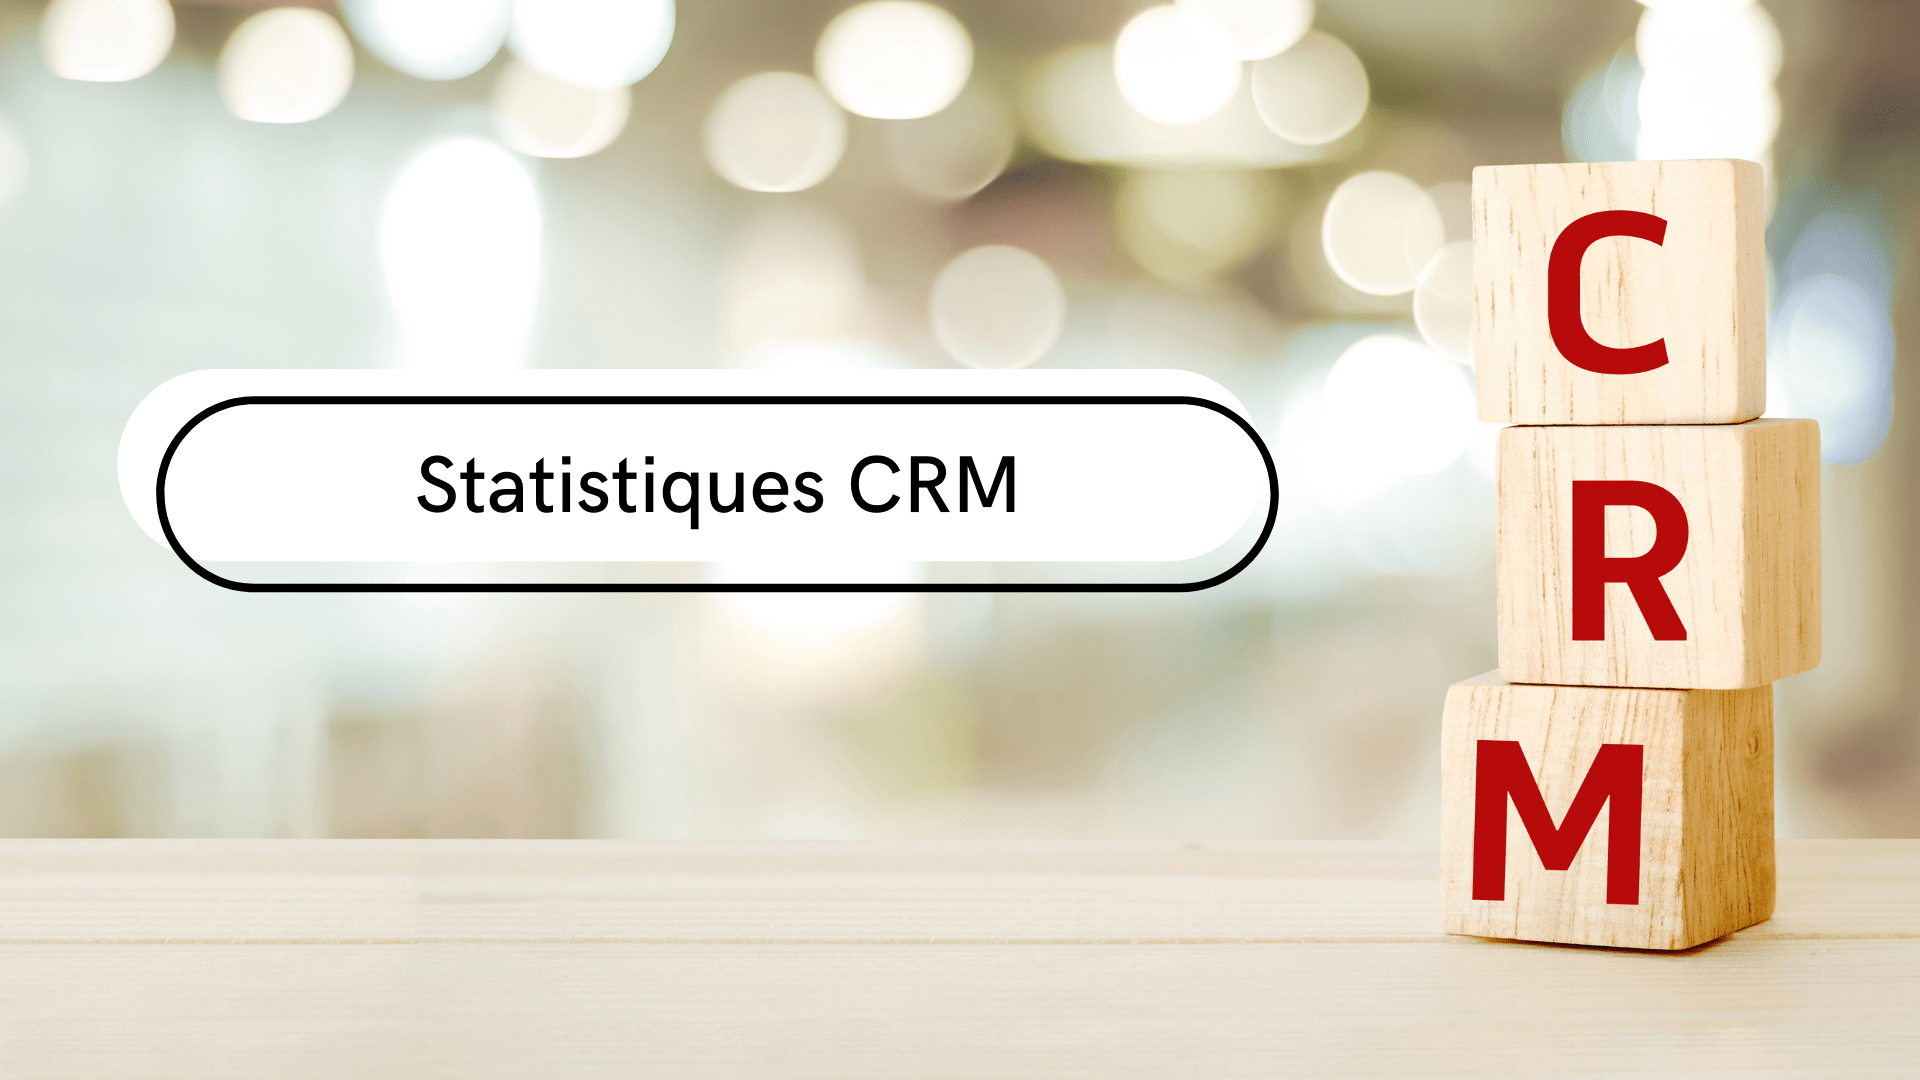 Statistiques CRM